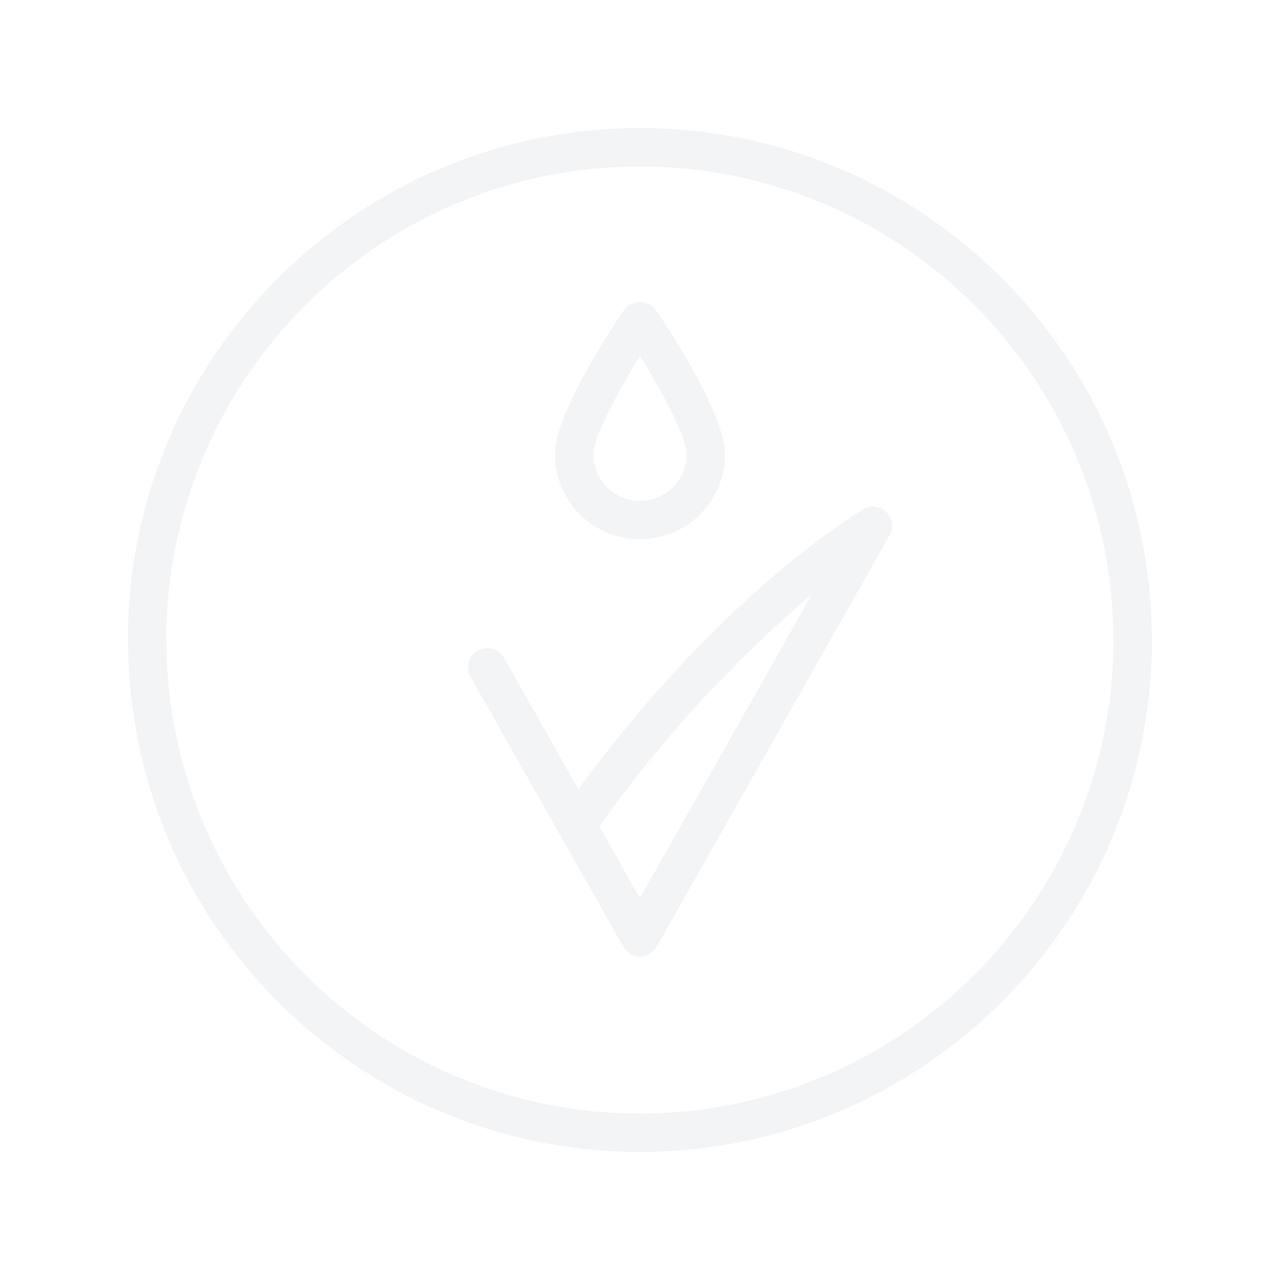 MAKEUP REVOLUTION Flawless Foil 2g